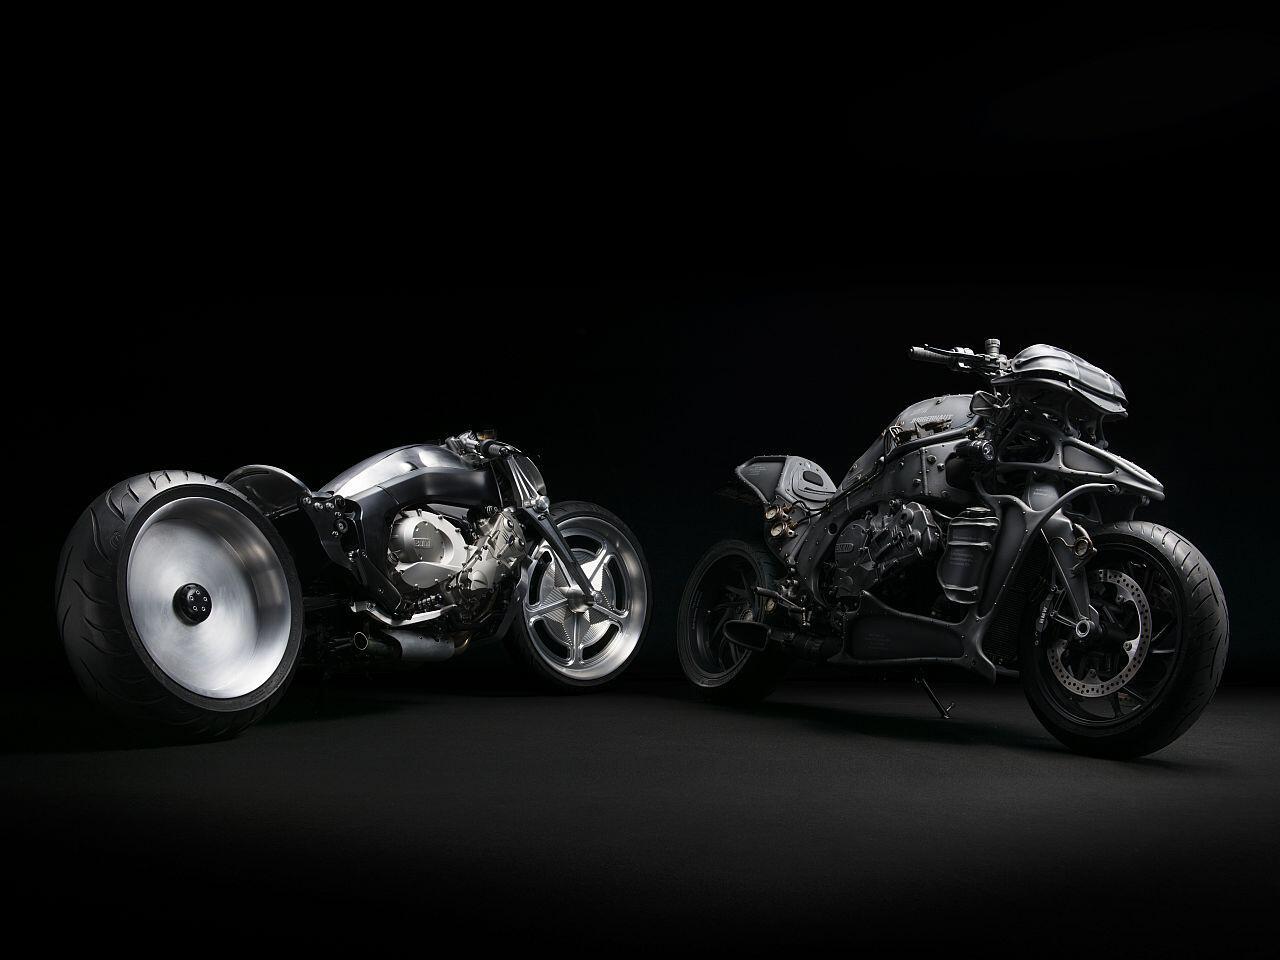 Bild zu BMW K 1600 GTL: BMW Motorrad mutiert zu radikalen Monster-Maschinen